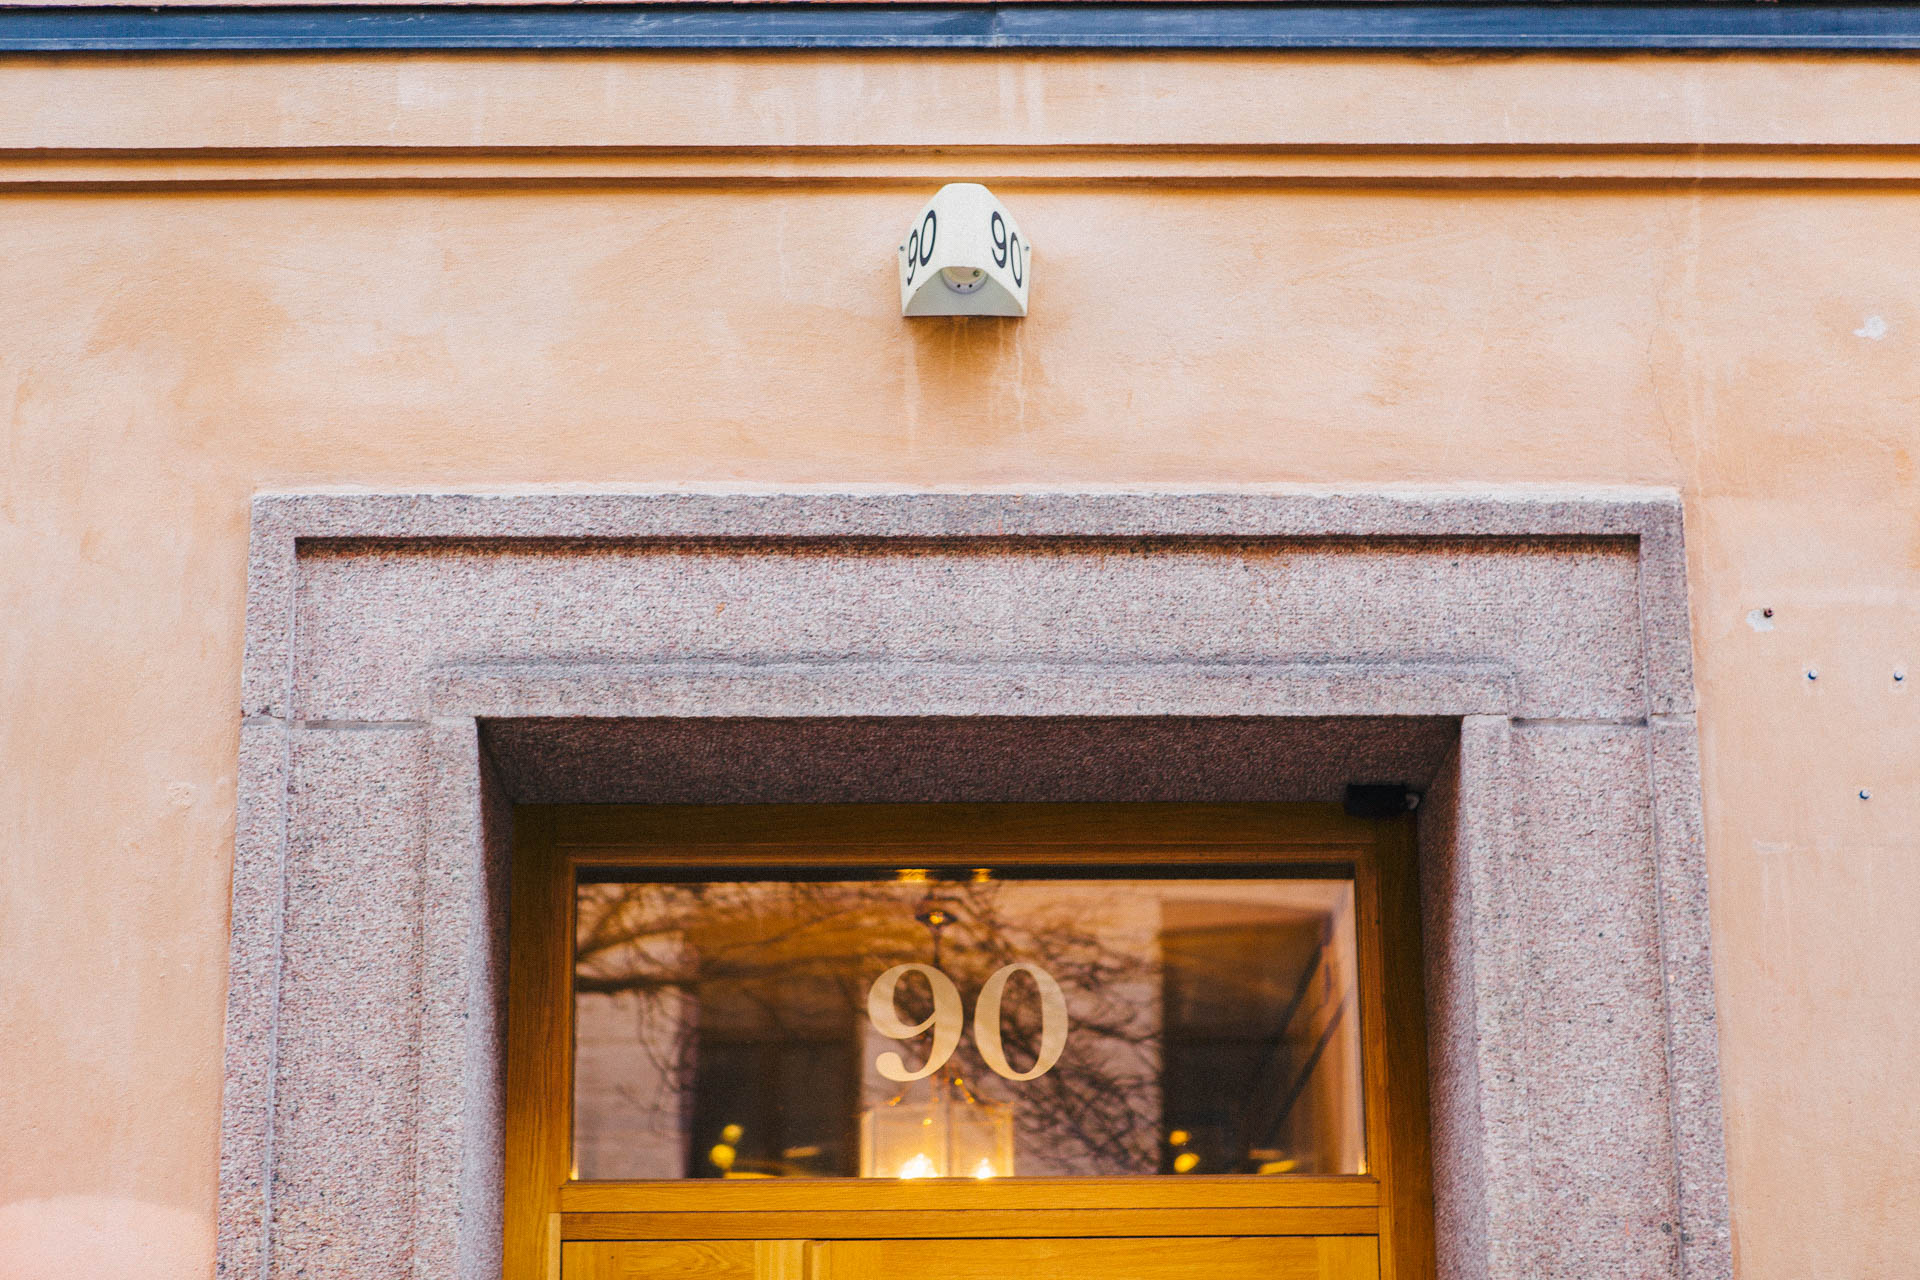 Nooks-Brannkyrkagatan-90-18